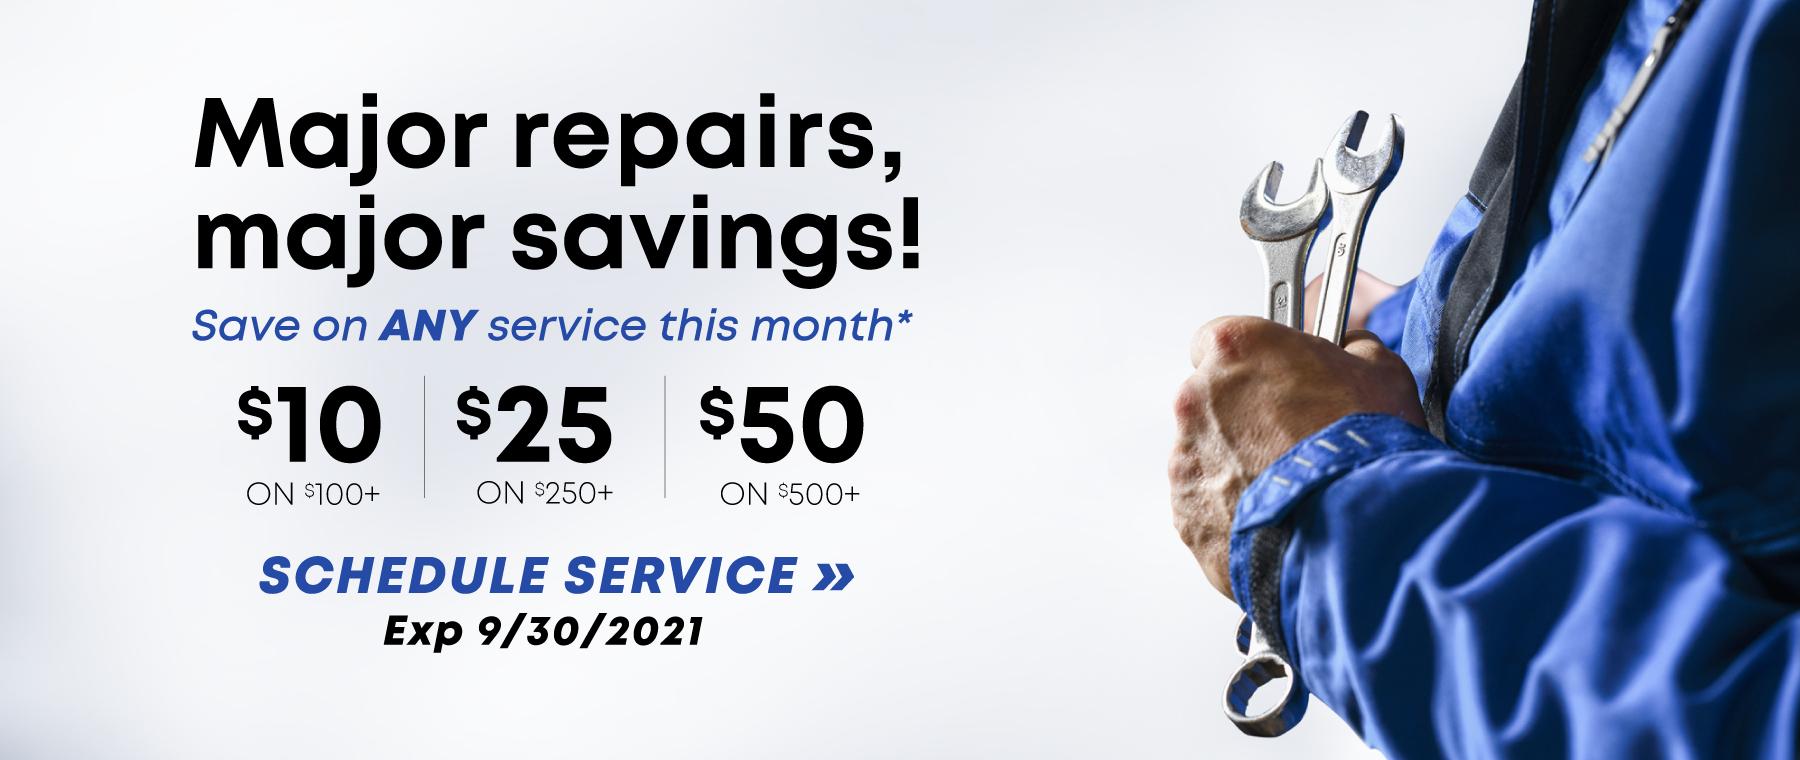 KGC_11147_RepairServiceSpecial_0921_Hero_1800x760